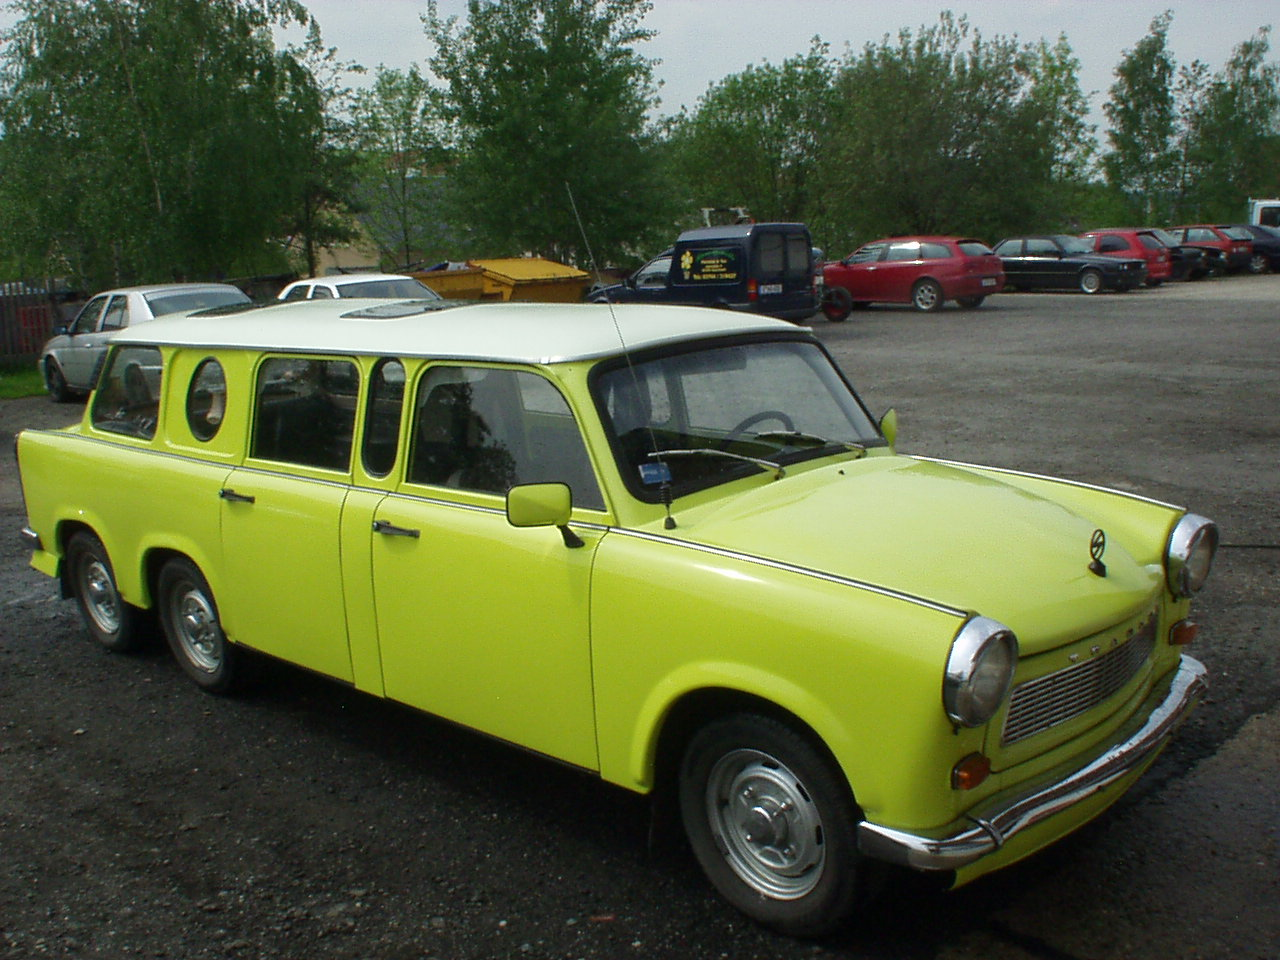 trabant on pinterest germany cars and campers. Black Bedroom Furniture Sets. Home Design Ideas